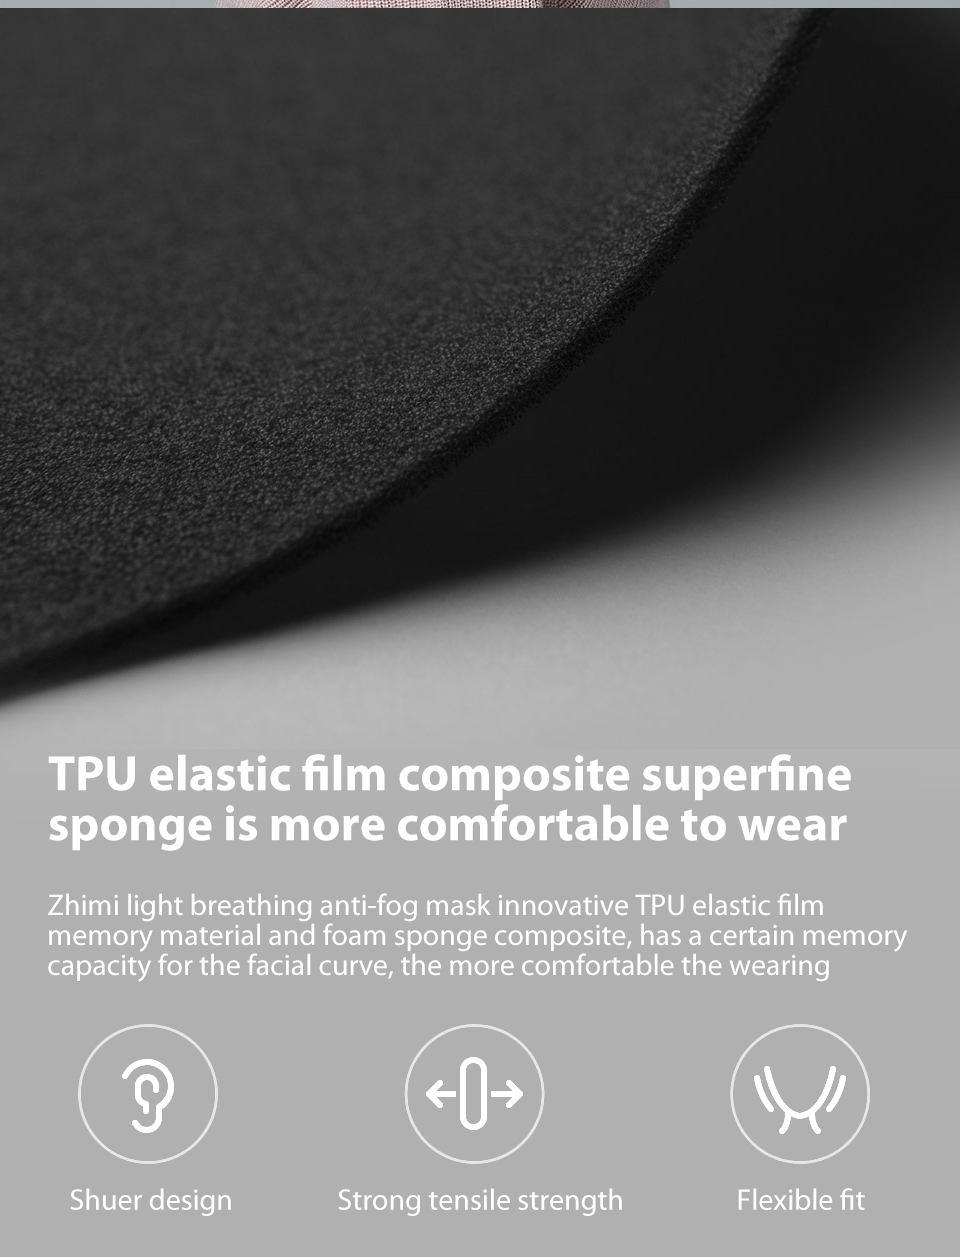 Xiaomi Mijia Smartmi Filter Mask Block 97% PM 2.5 with Ventilating Valve Long-lasting TPU Material 3 PCS Filter Mask Smart Home (12)